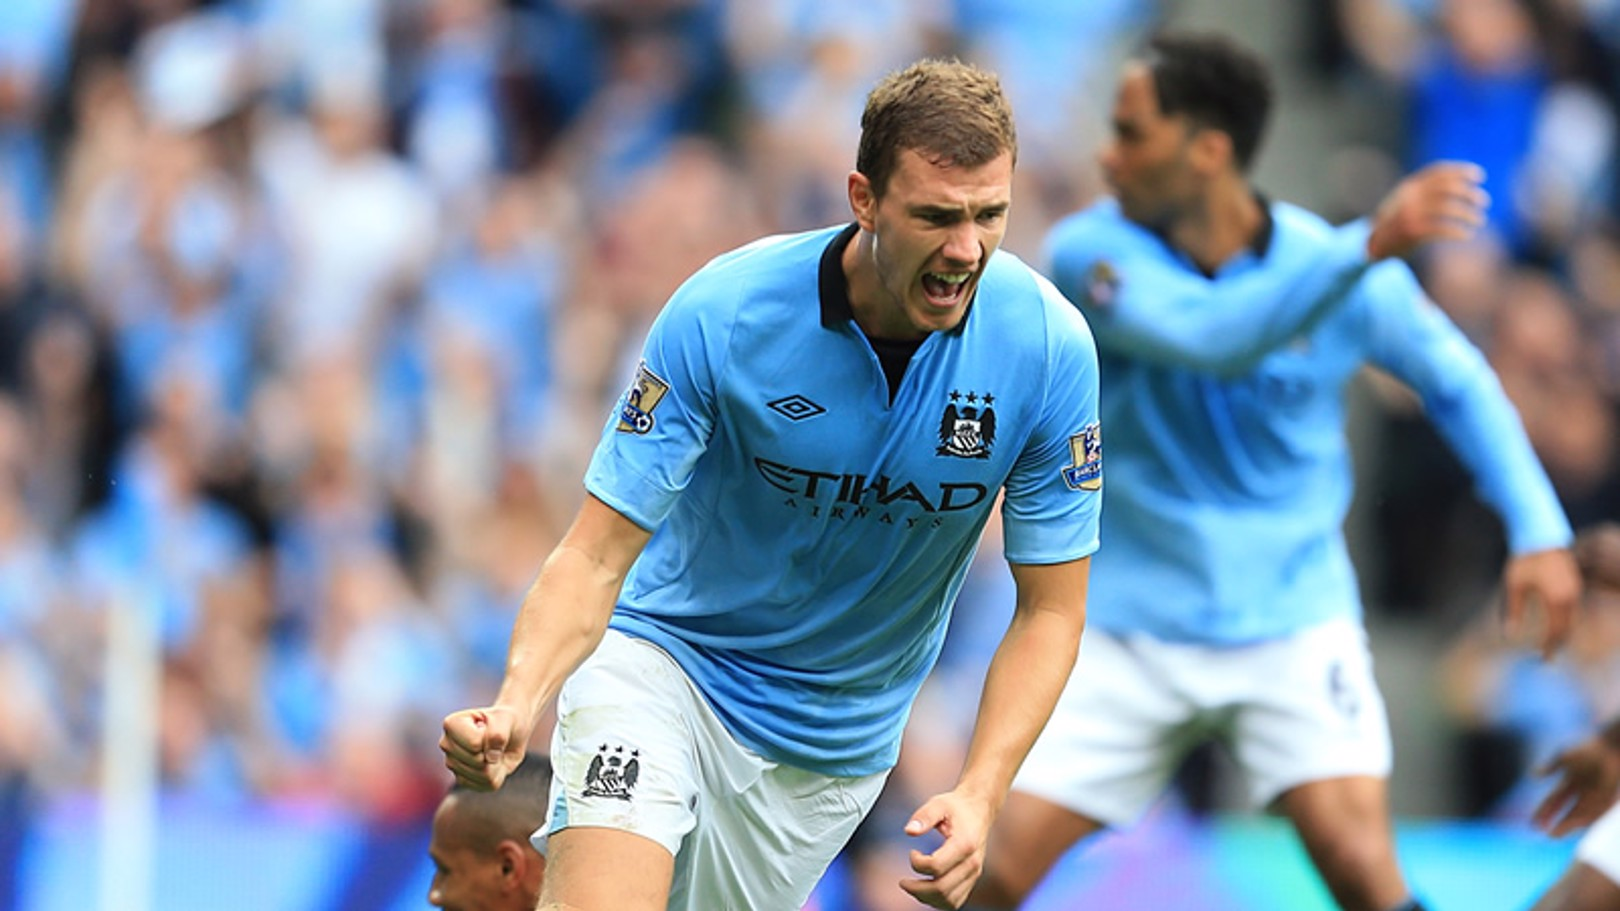 Edin Dzeko is amongst the goals as City narrowly beat Southampton 3-2